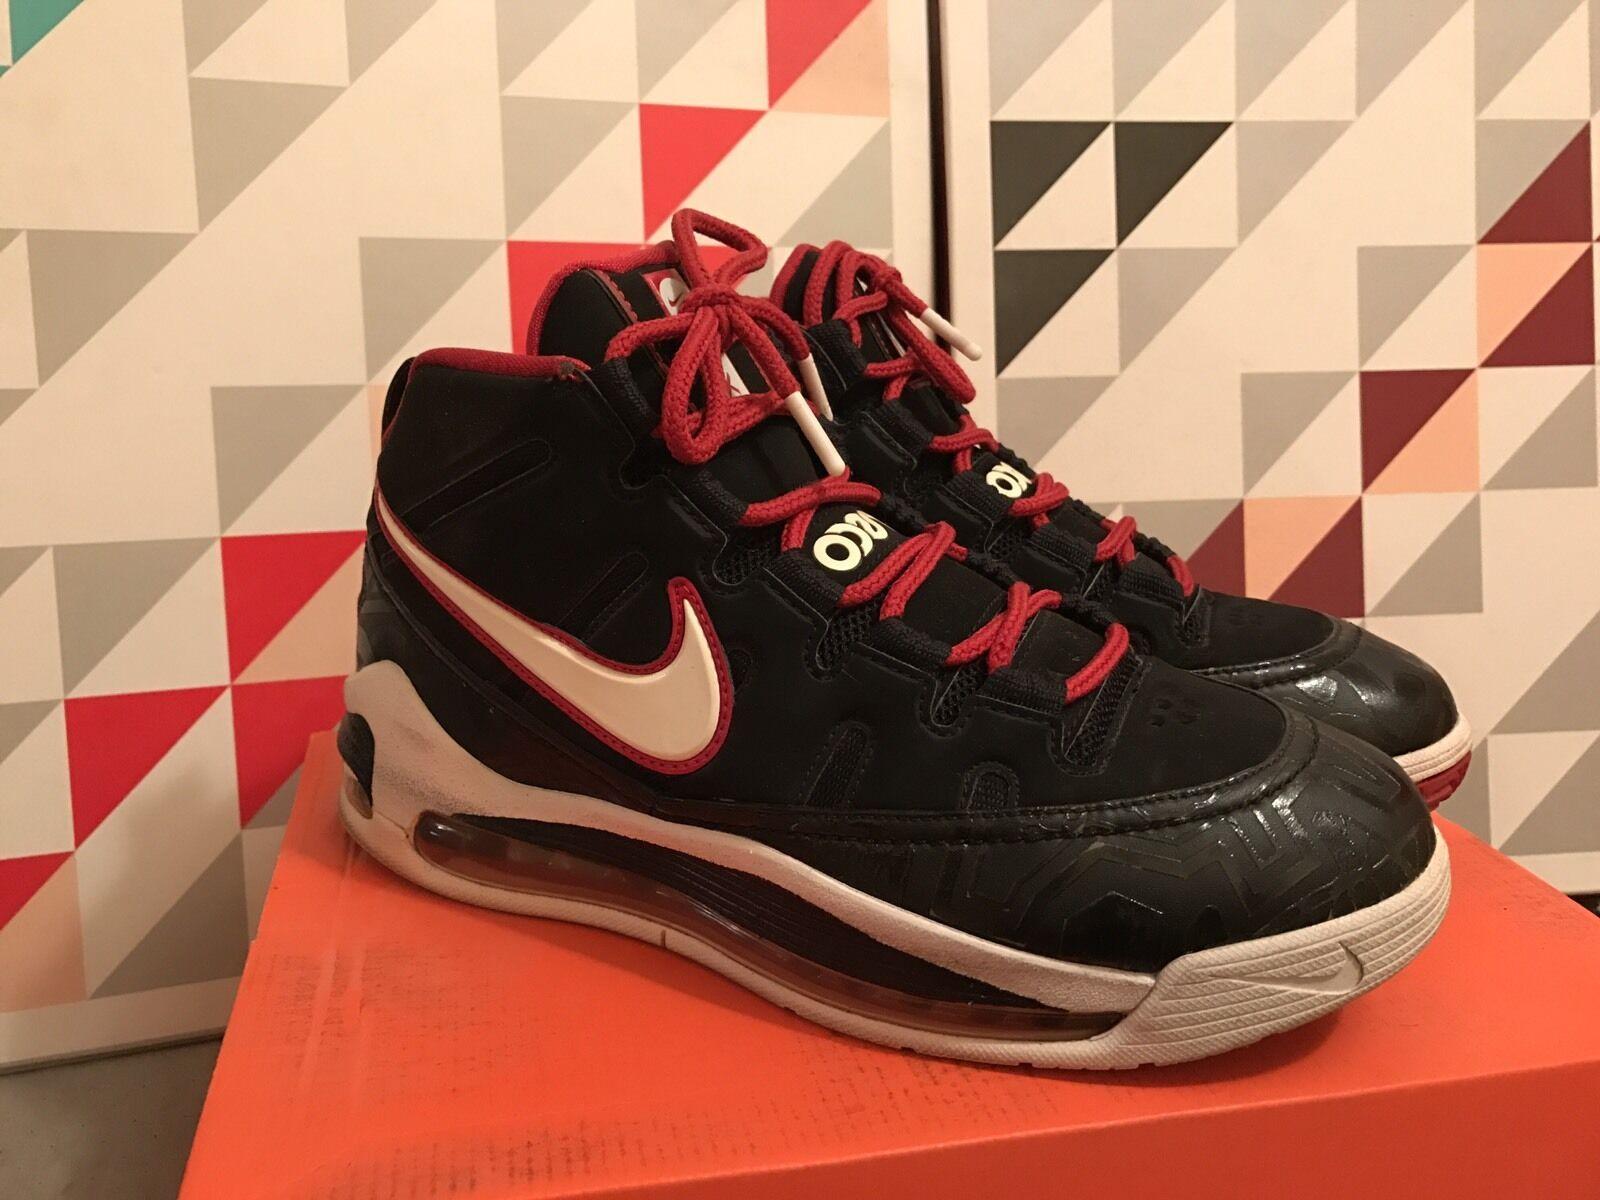 Nike power max greg oden pe portland trail blazers  hoh damian lillard